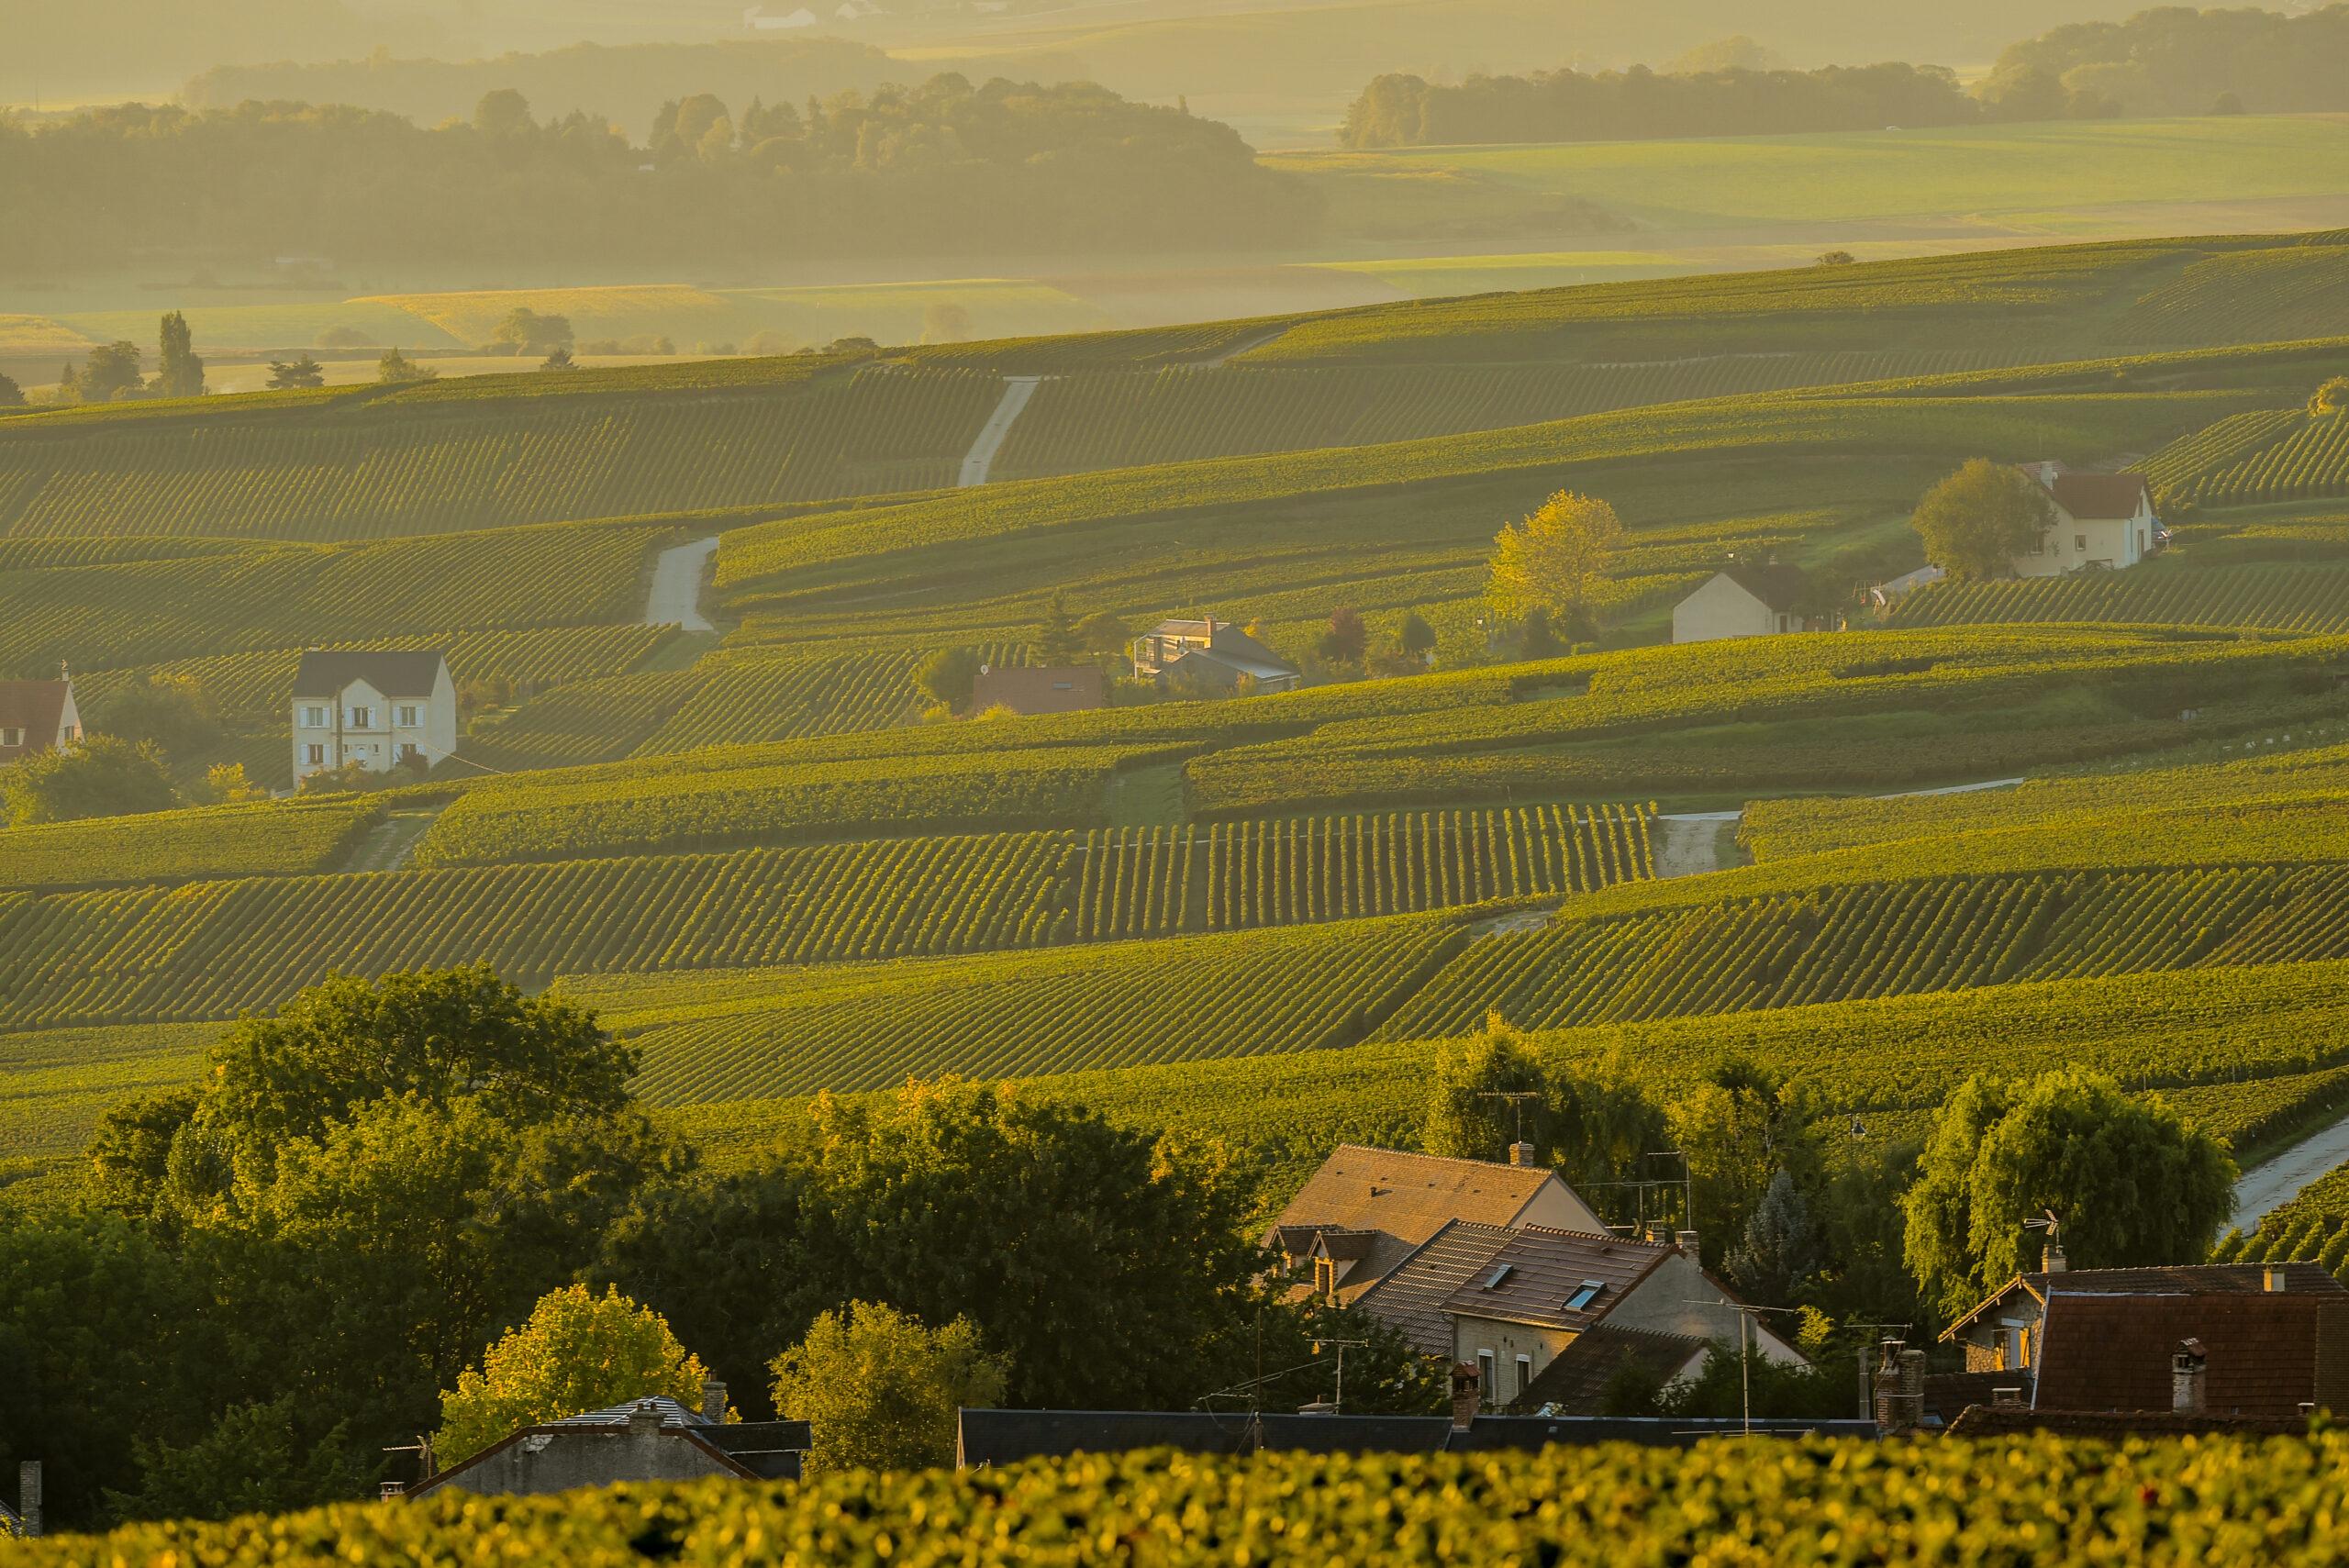 Champagne vineyards Villedomange in Marne department, Champagne-Ardennes, France, Europe.